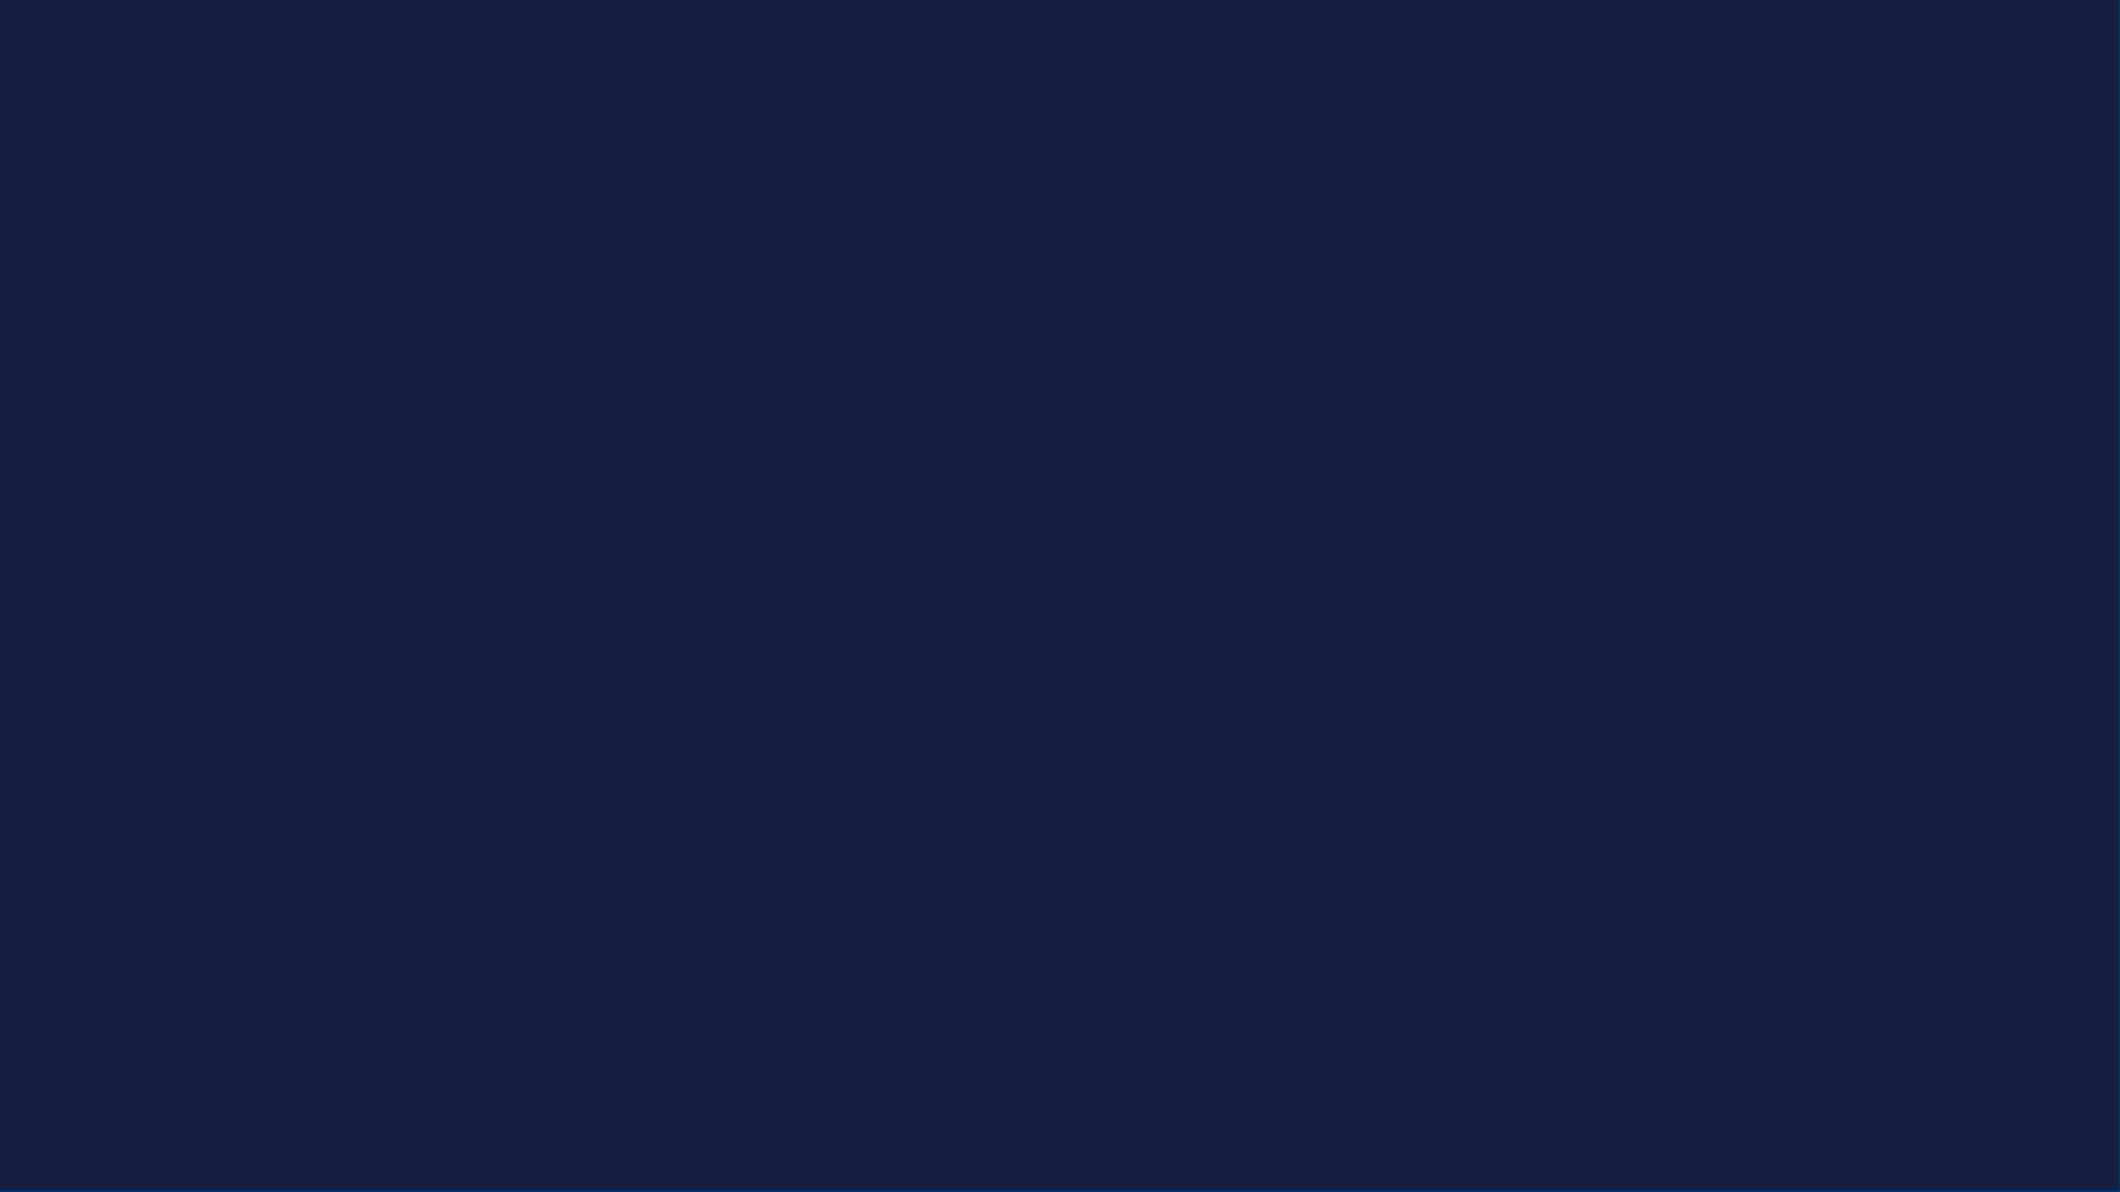 [73+] Navy Blue Backgrounds on WallpaperSafari